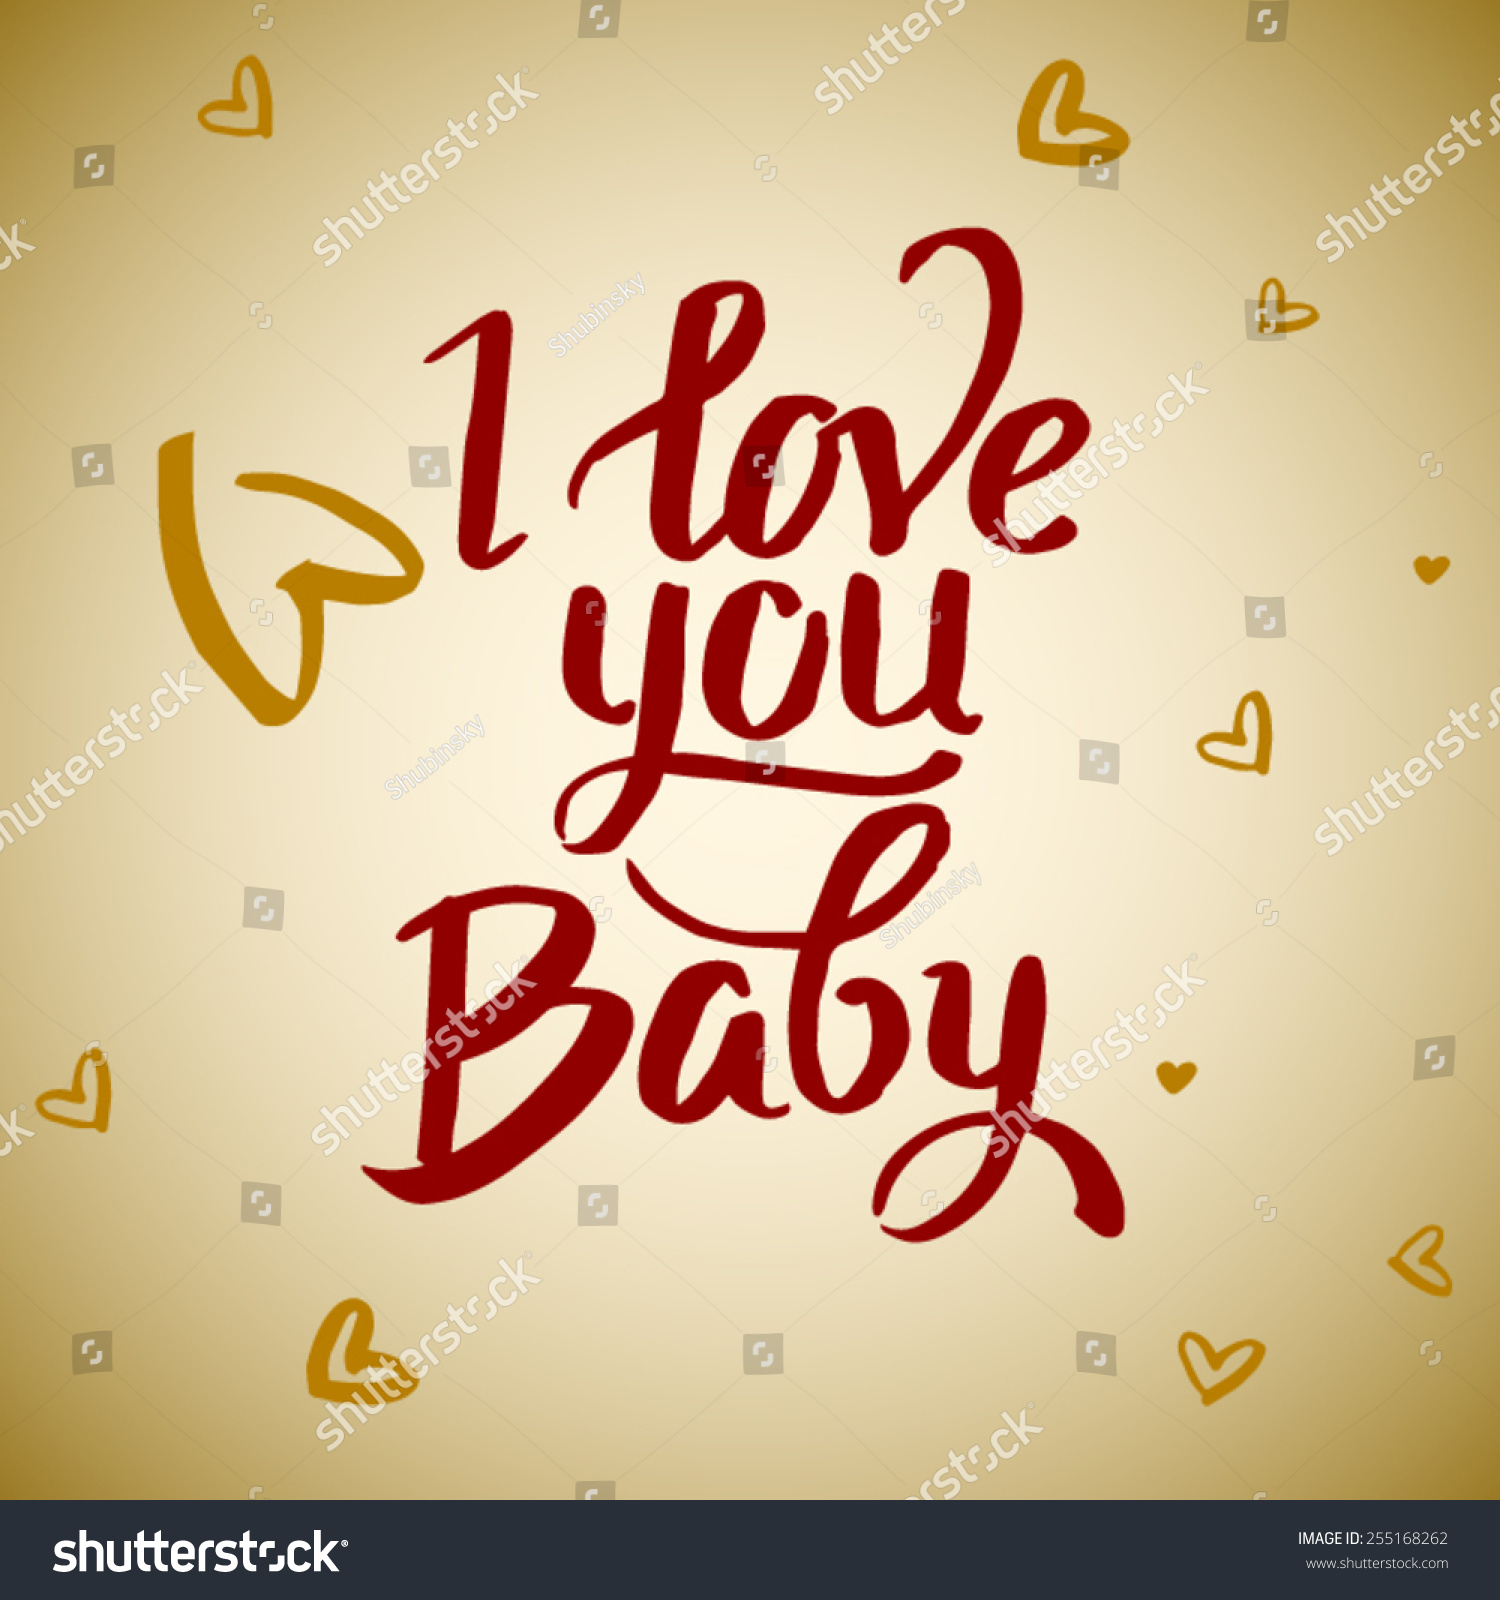 Wallpaper Love U Baby : love u baby pics Wallpaper sportstle